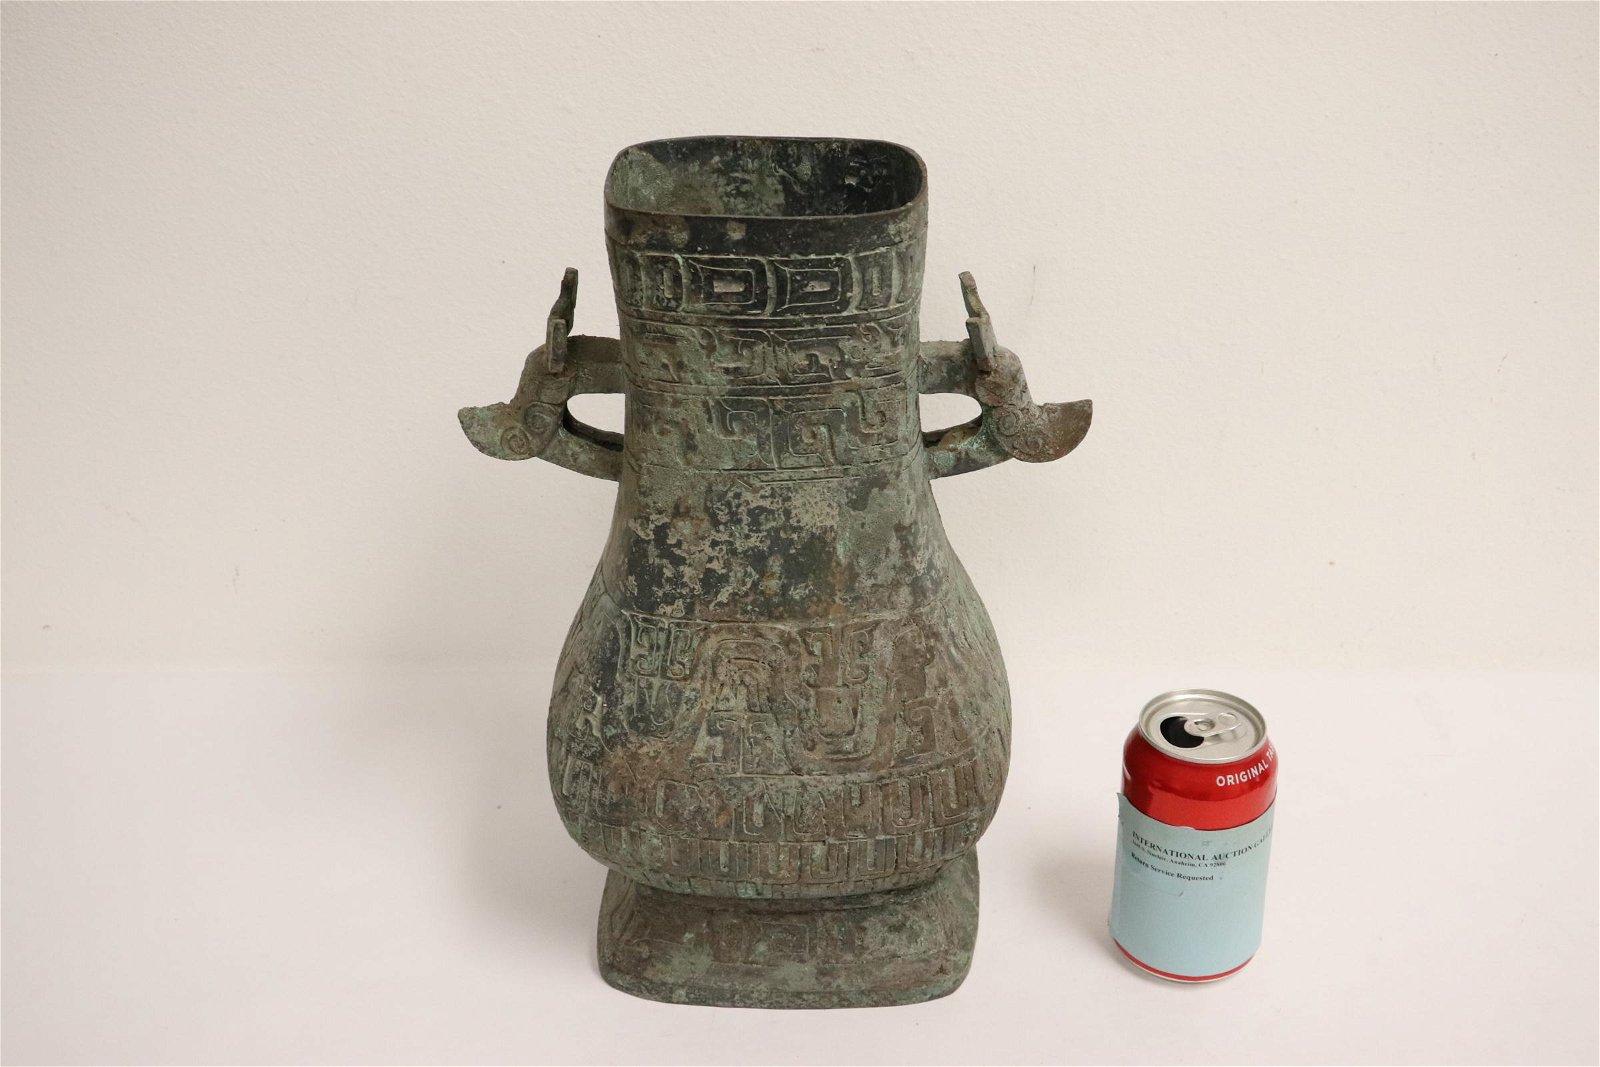 Chinese archaic style bronze jar